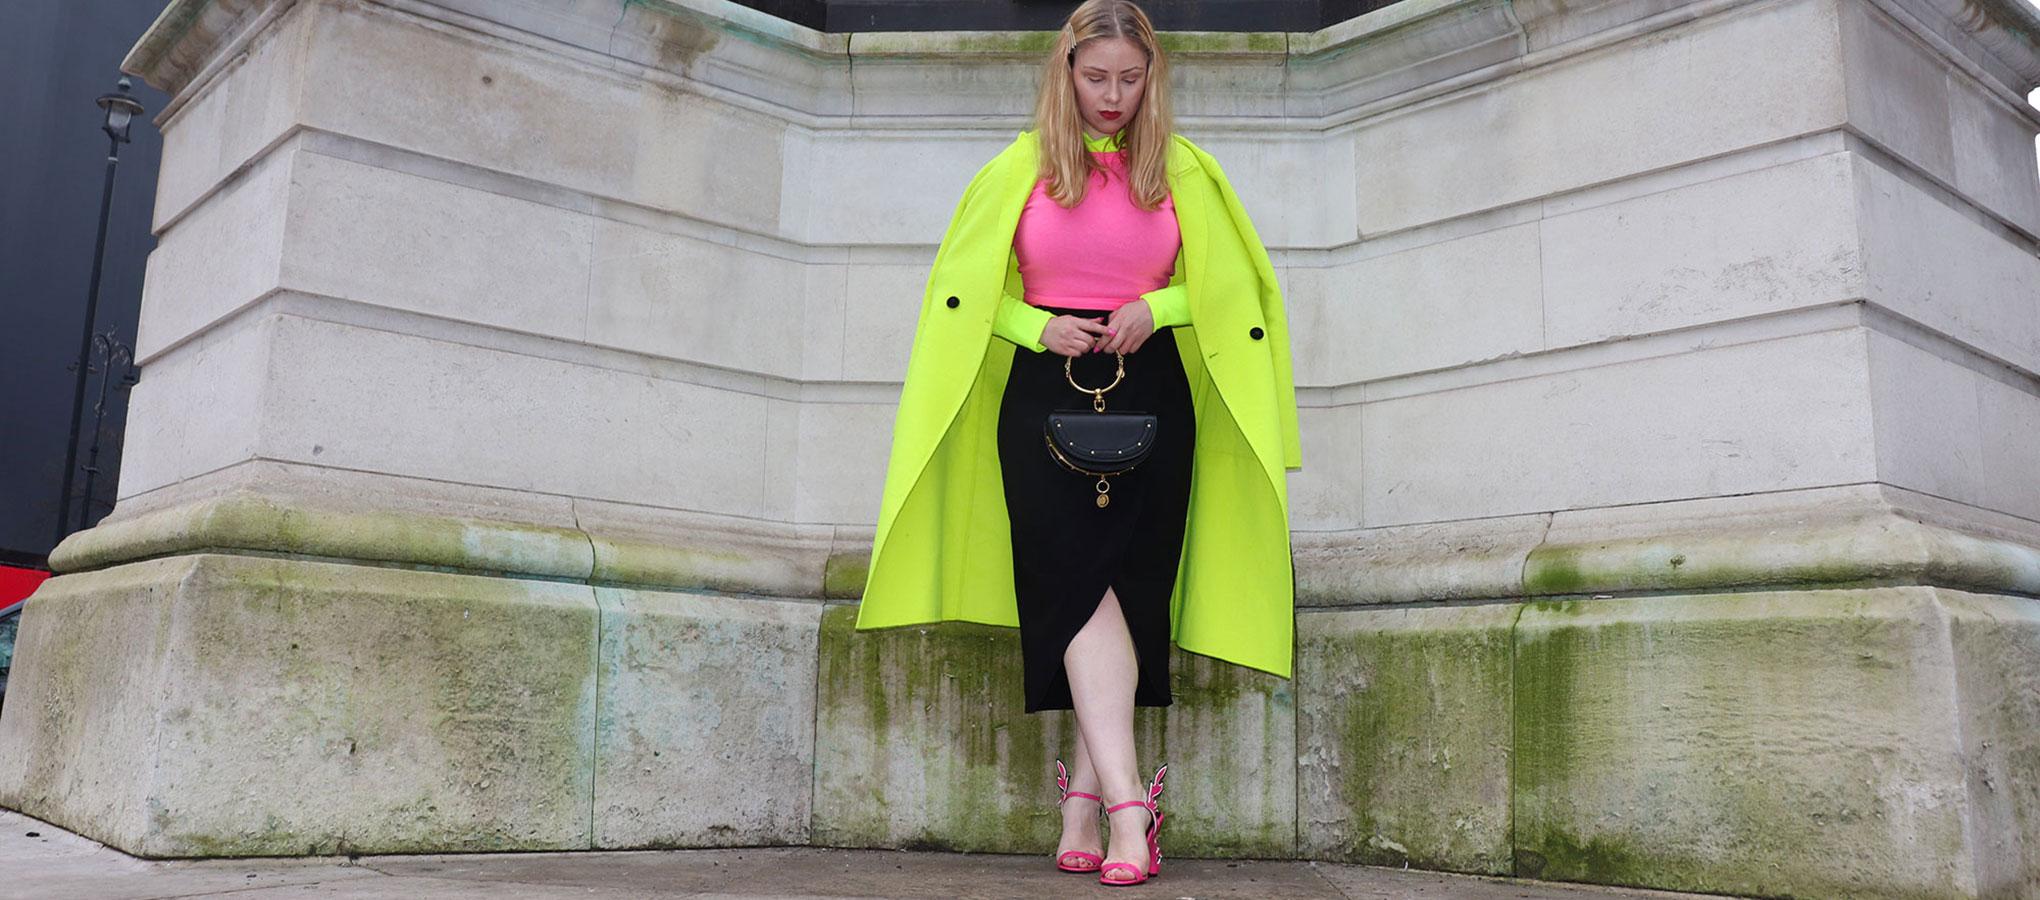 The Shoot: London Fashion Week Day 2